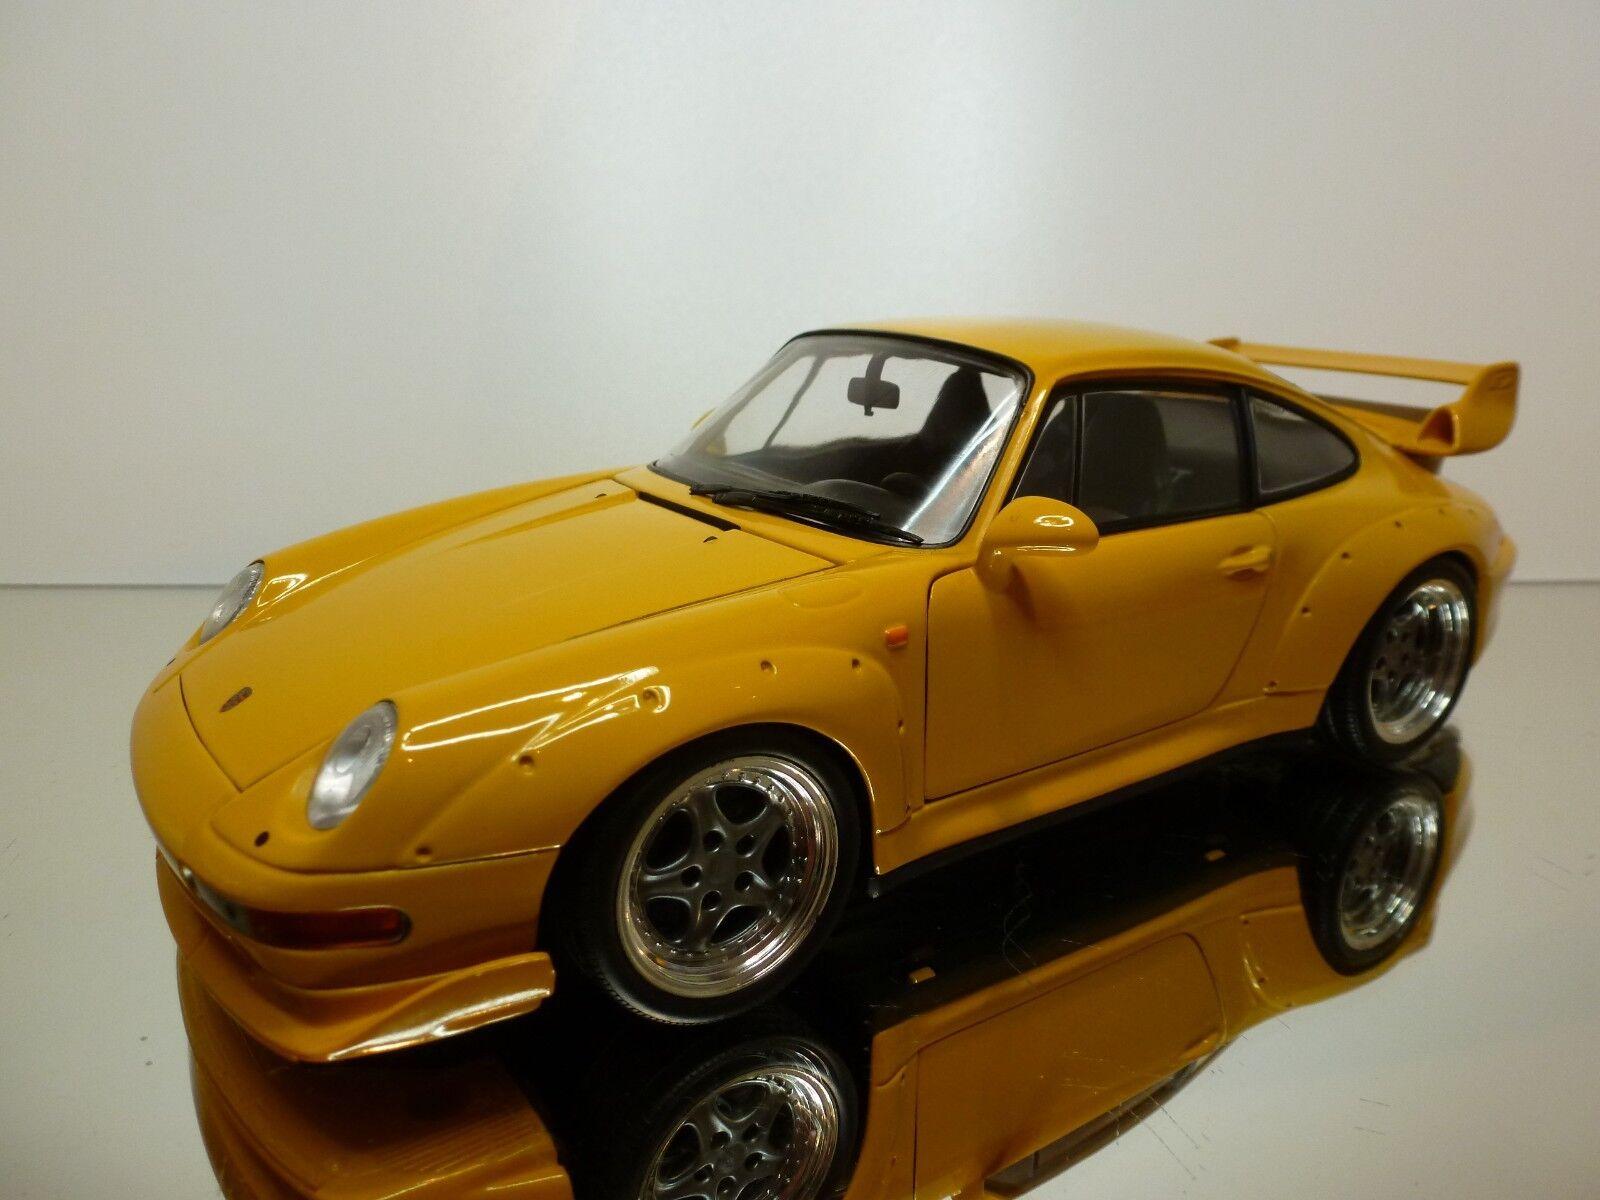 UT MODELS PORSCHE 911 GT 1997 - amarillo 1 18 - VERY GOOD CONDITION